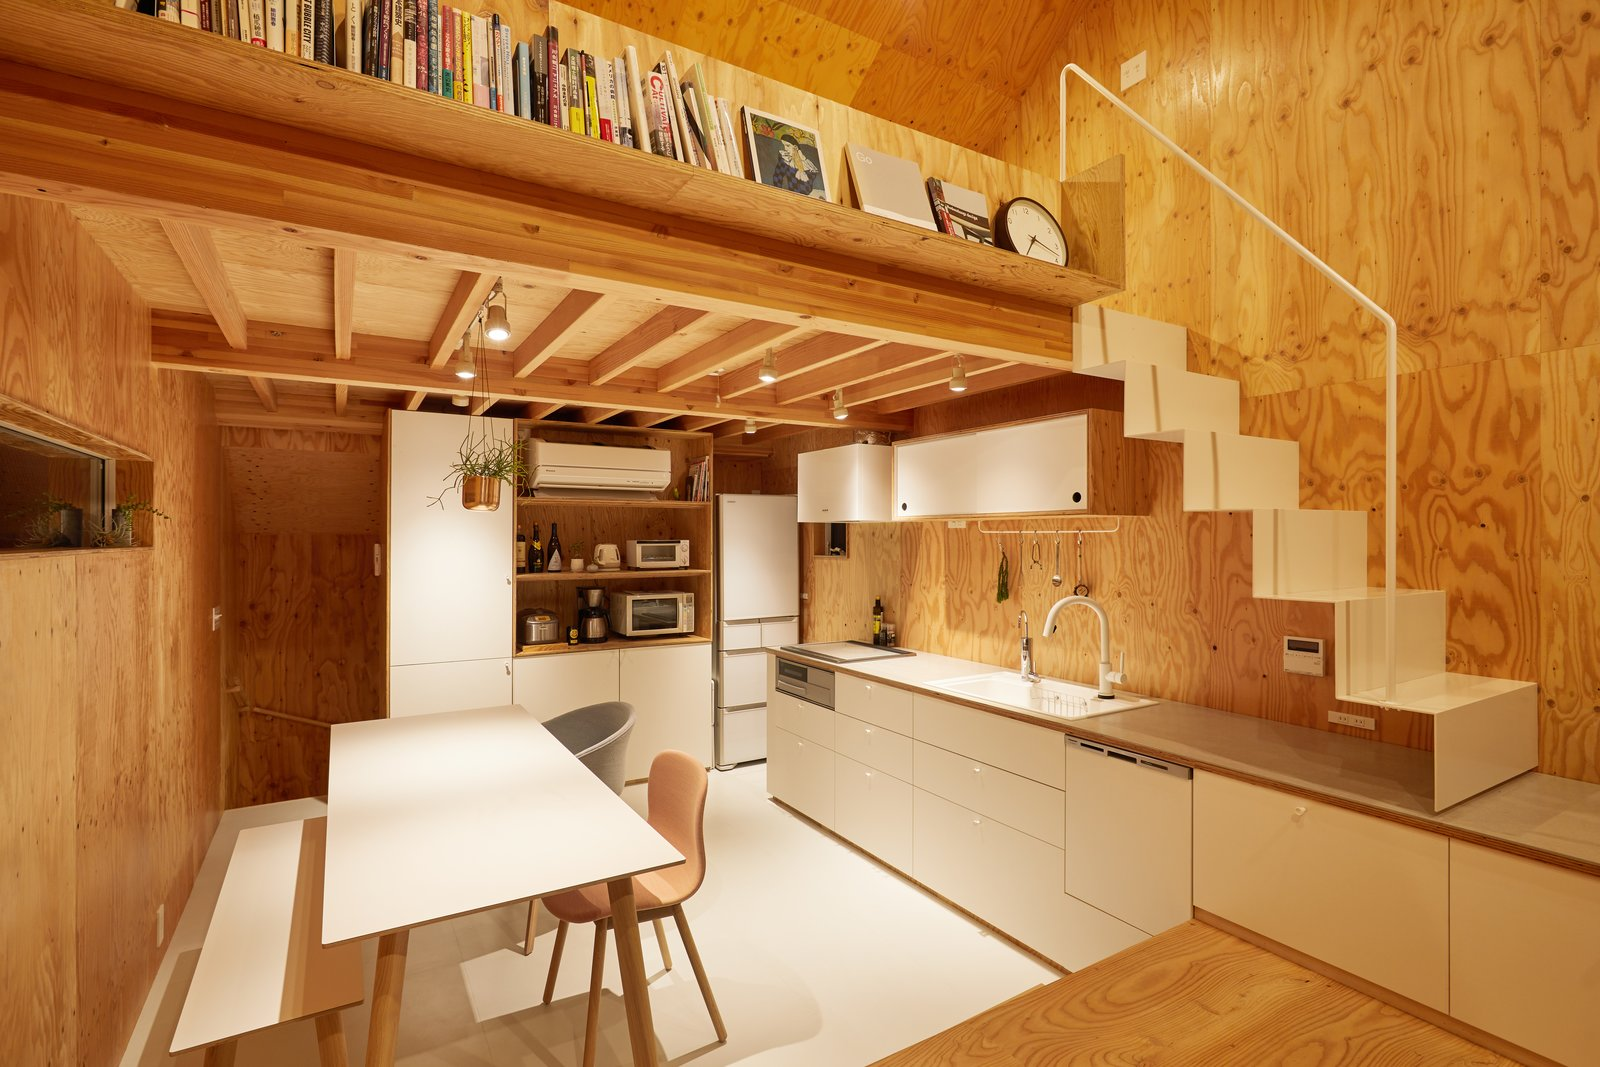 Milk Carton House Tenhachi Architect and Interior Design kitchen